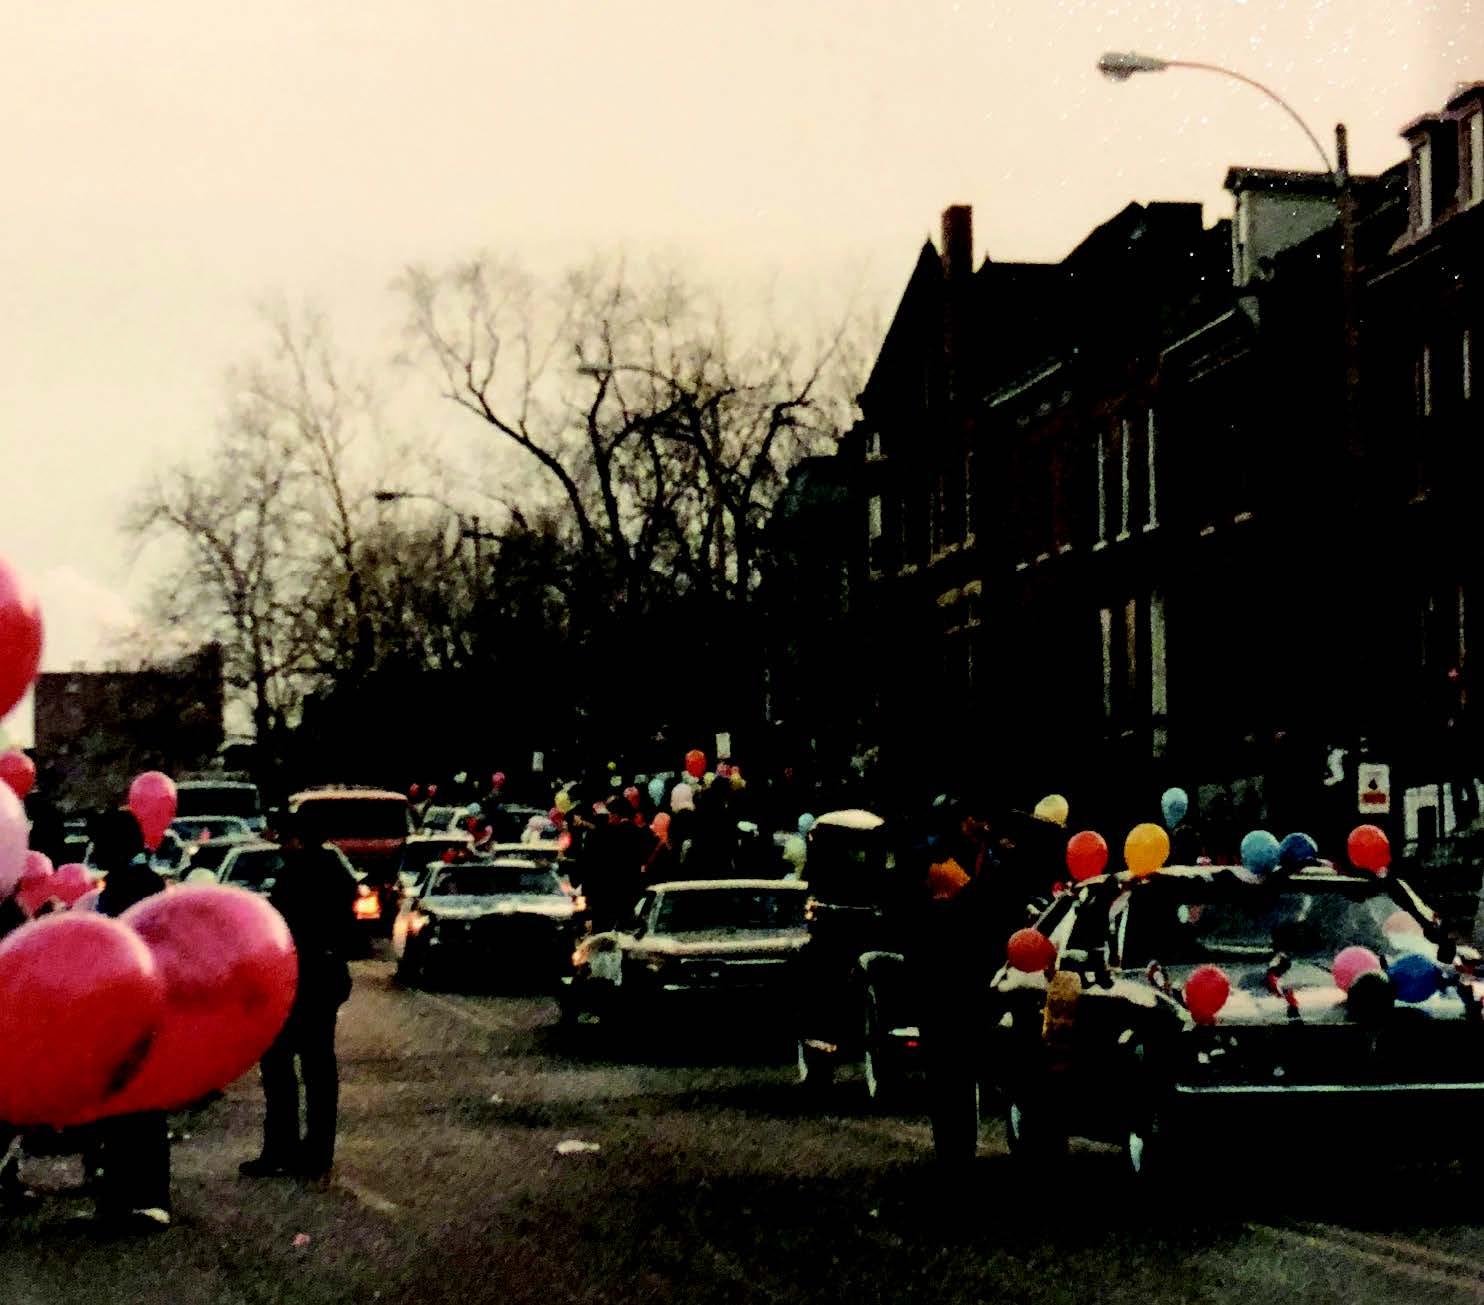 Circa 1985 mardi gras parade traveling northbound on 12th street at sunset.